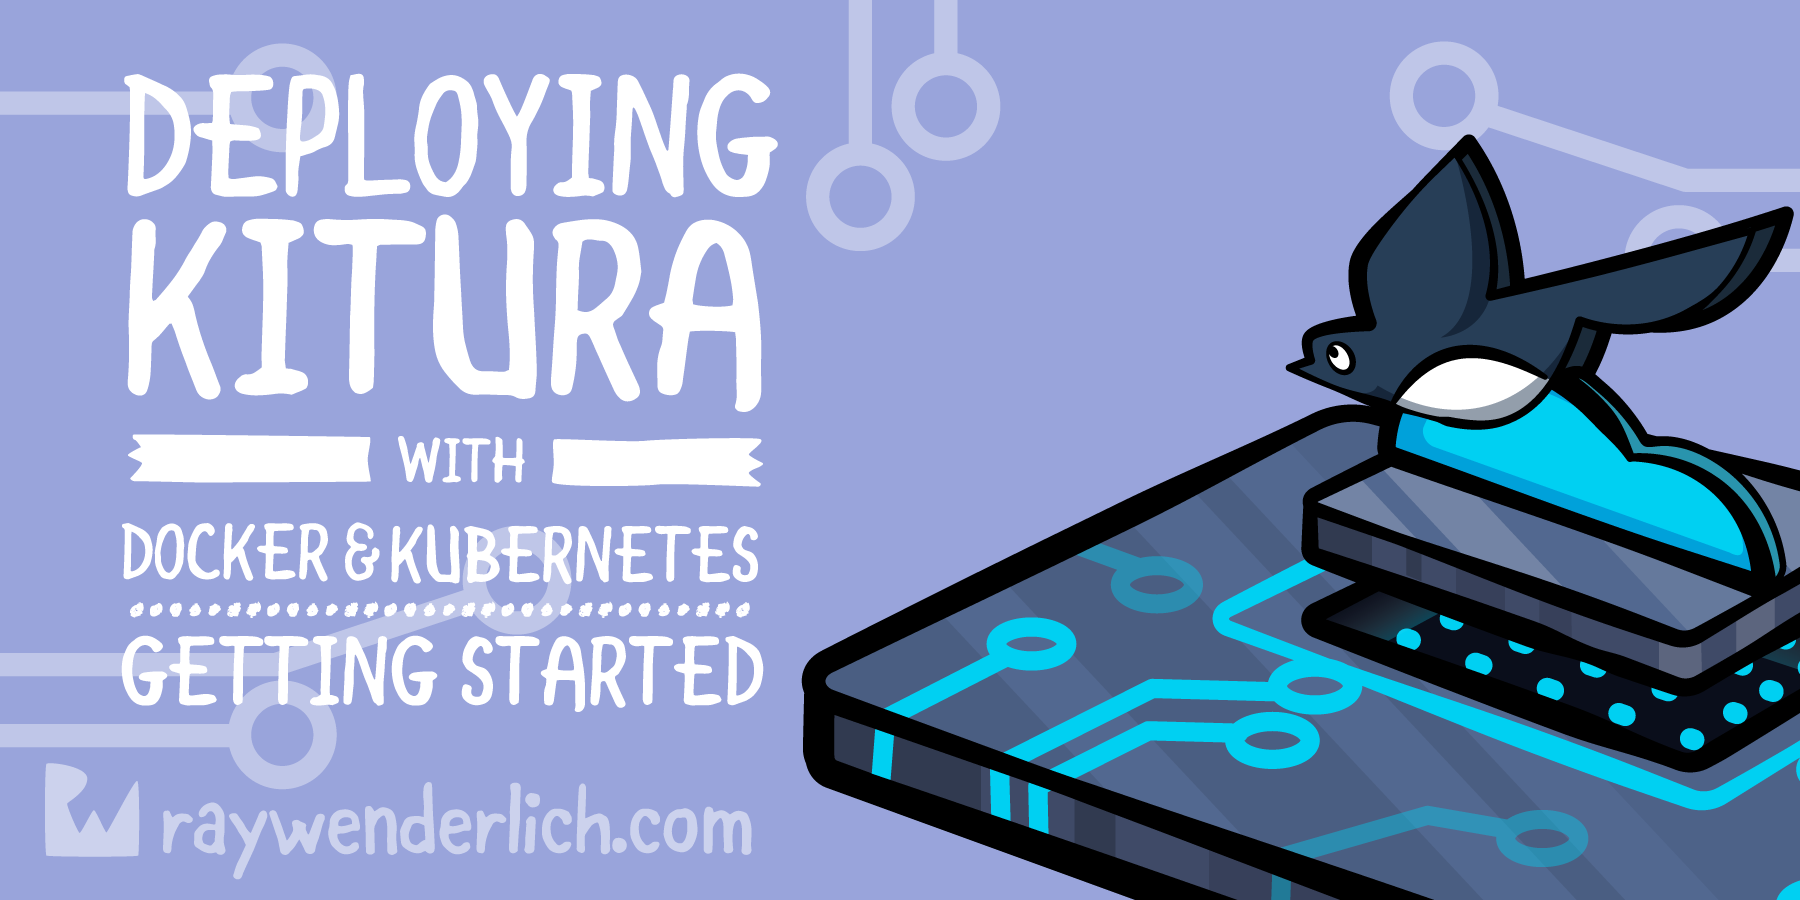 Deploying Kitura with Docker & Kubernetes: Getting Started